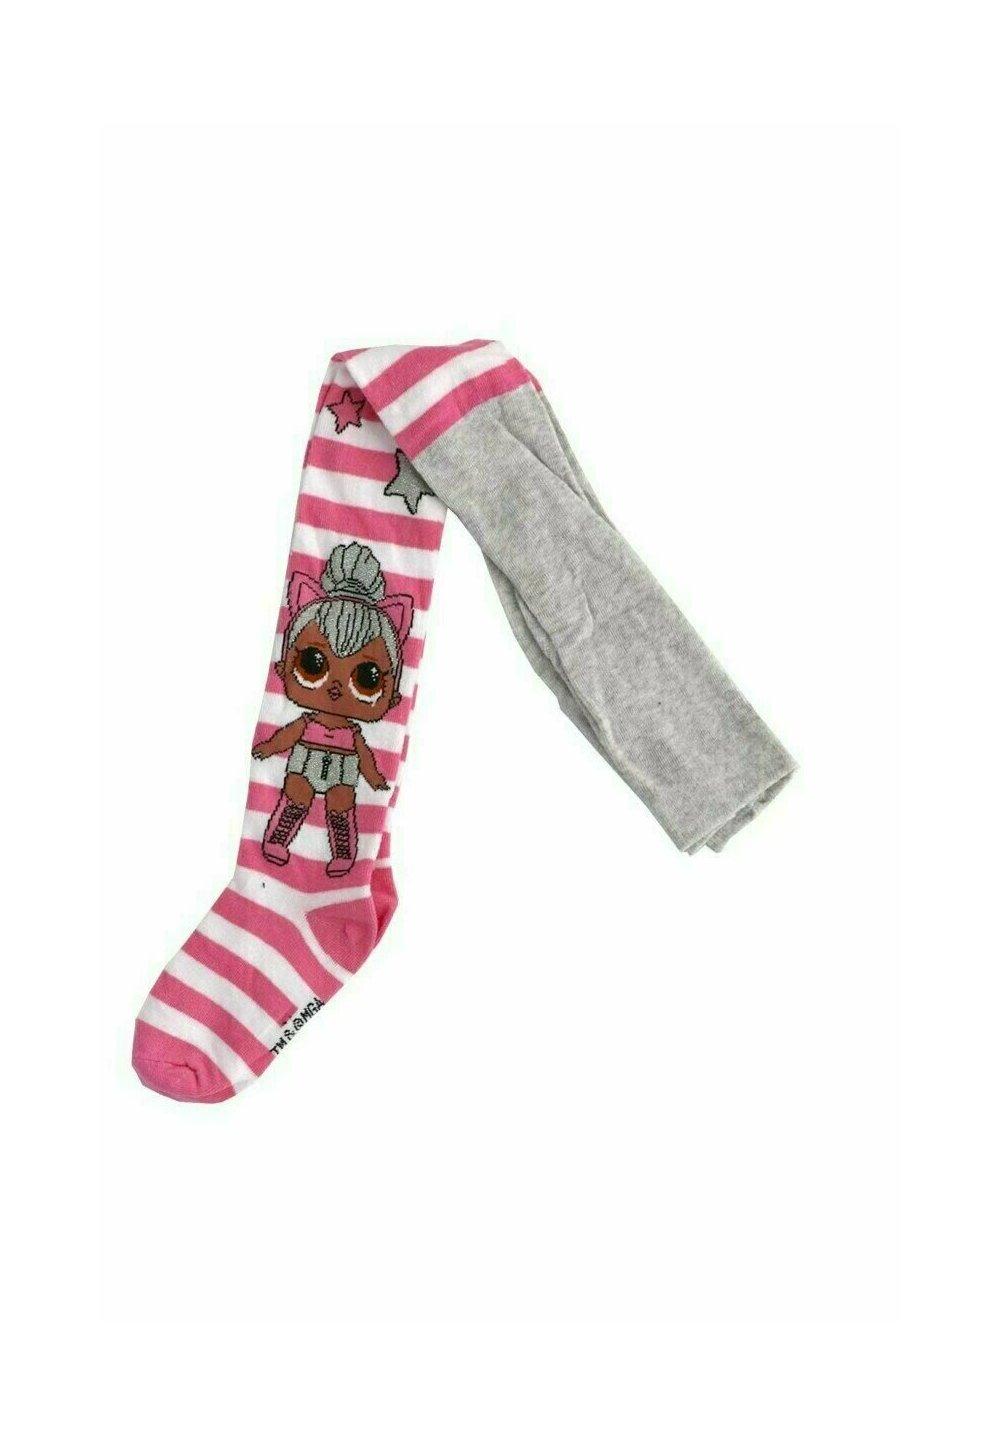 Ciorapi cu chilot, LOL Surprise, alb cu roz imagine